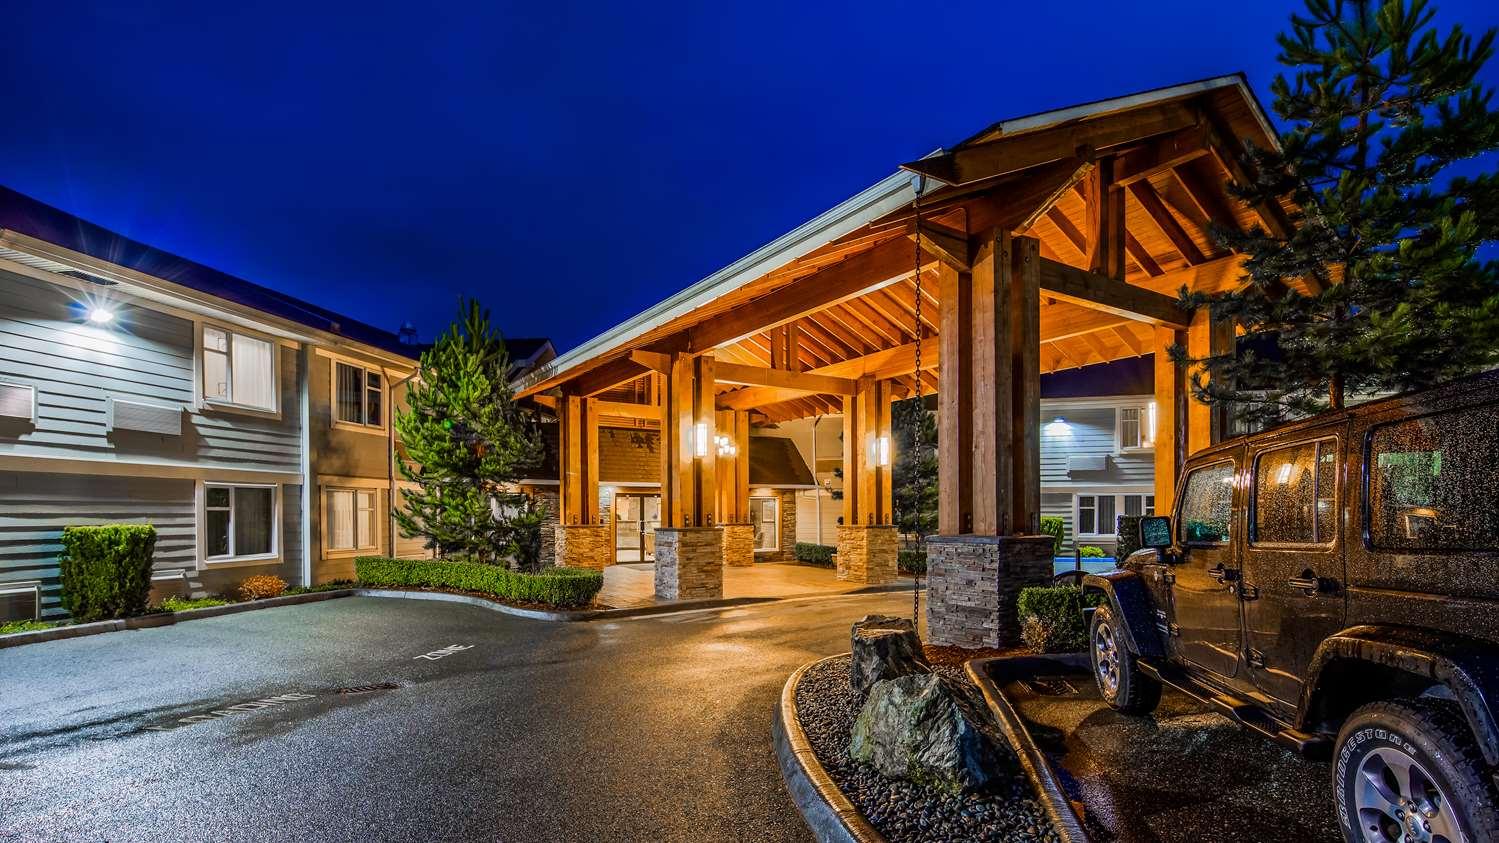 Best Western Hotel - Entrance